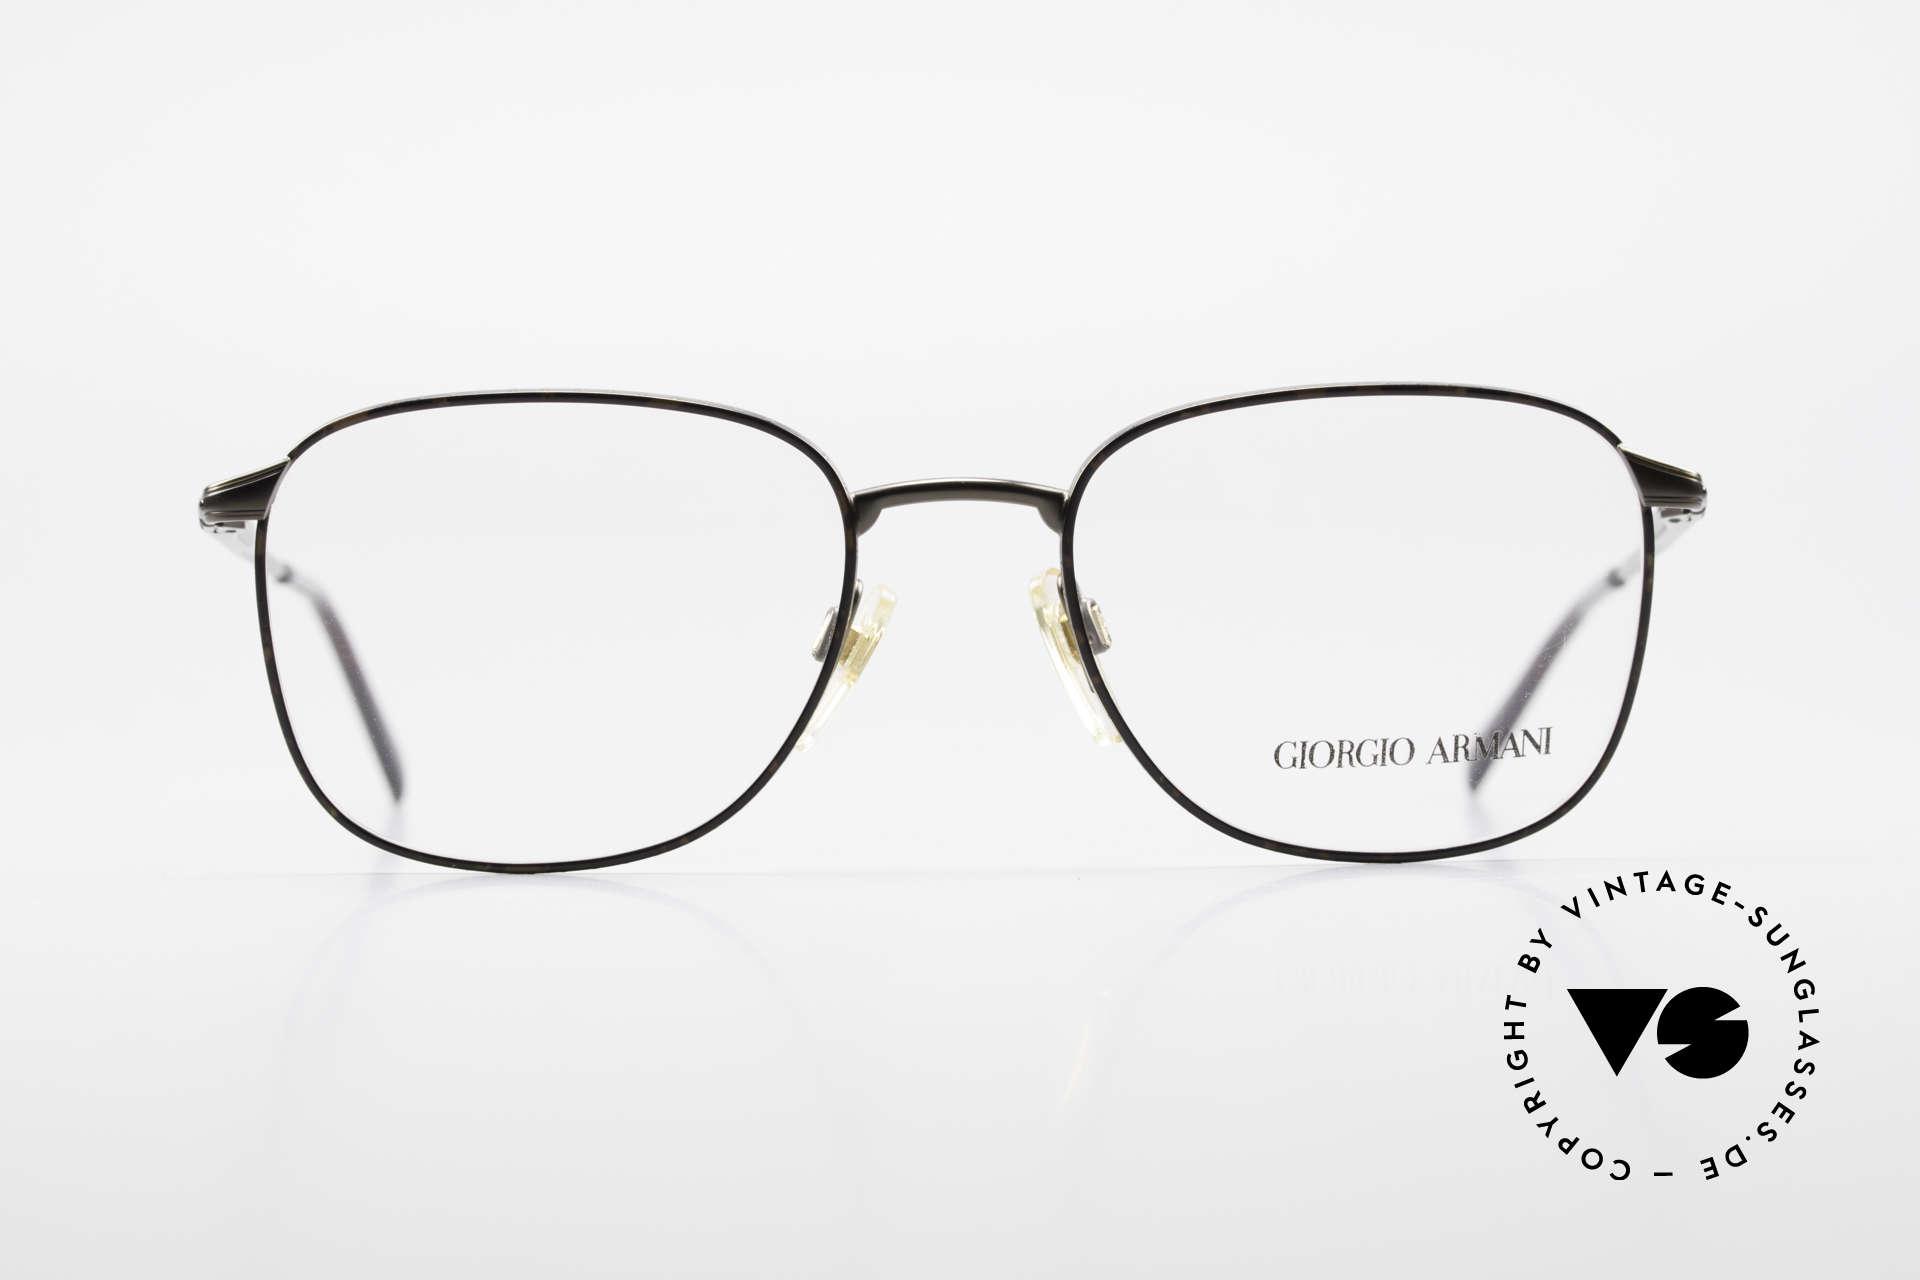 Giorgio Armani 236 Square Panto Vintage Frame, square 'panto' frame design .. a real eyewear classic, Made for Men